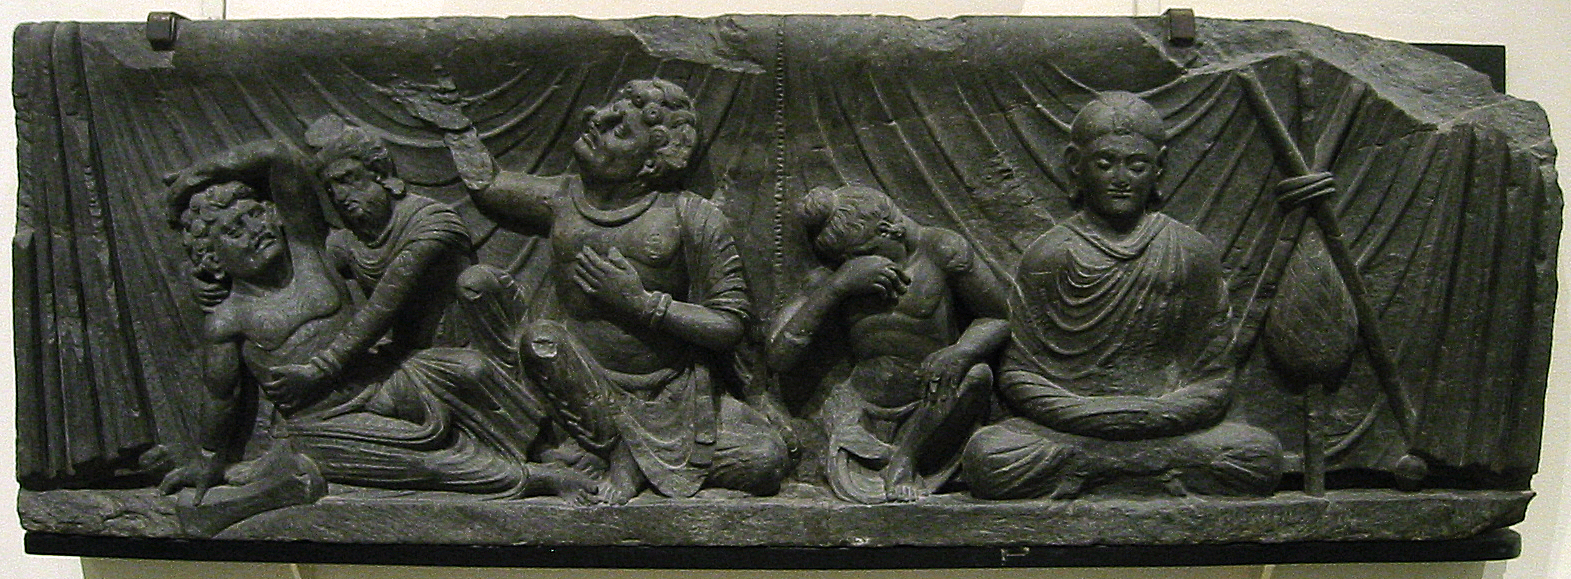 Attendants to the Parinirvana, Gandhara, Victoria and Albert museum